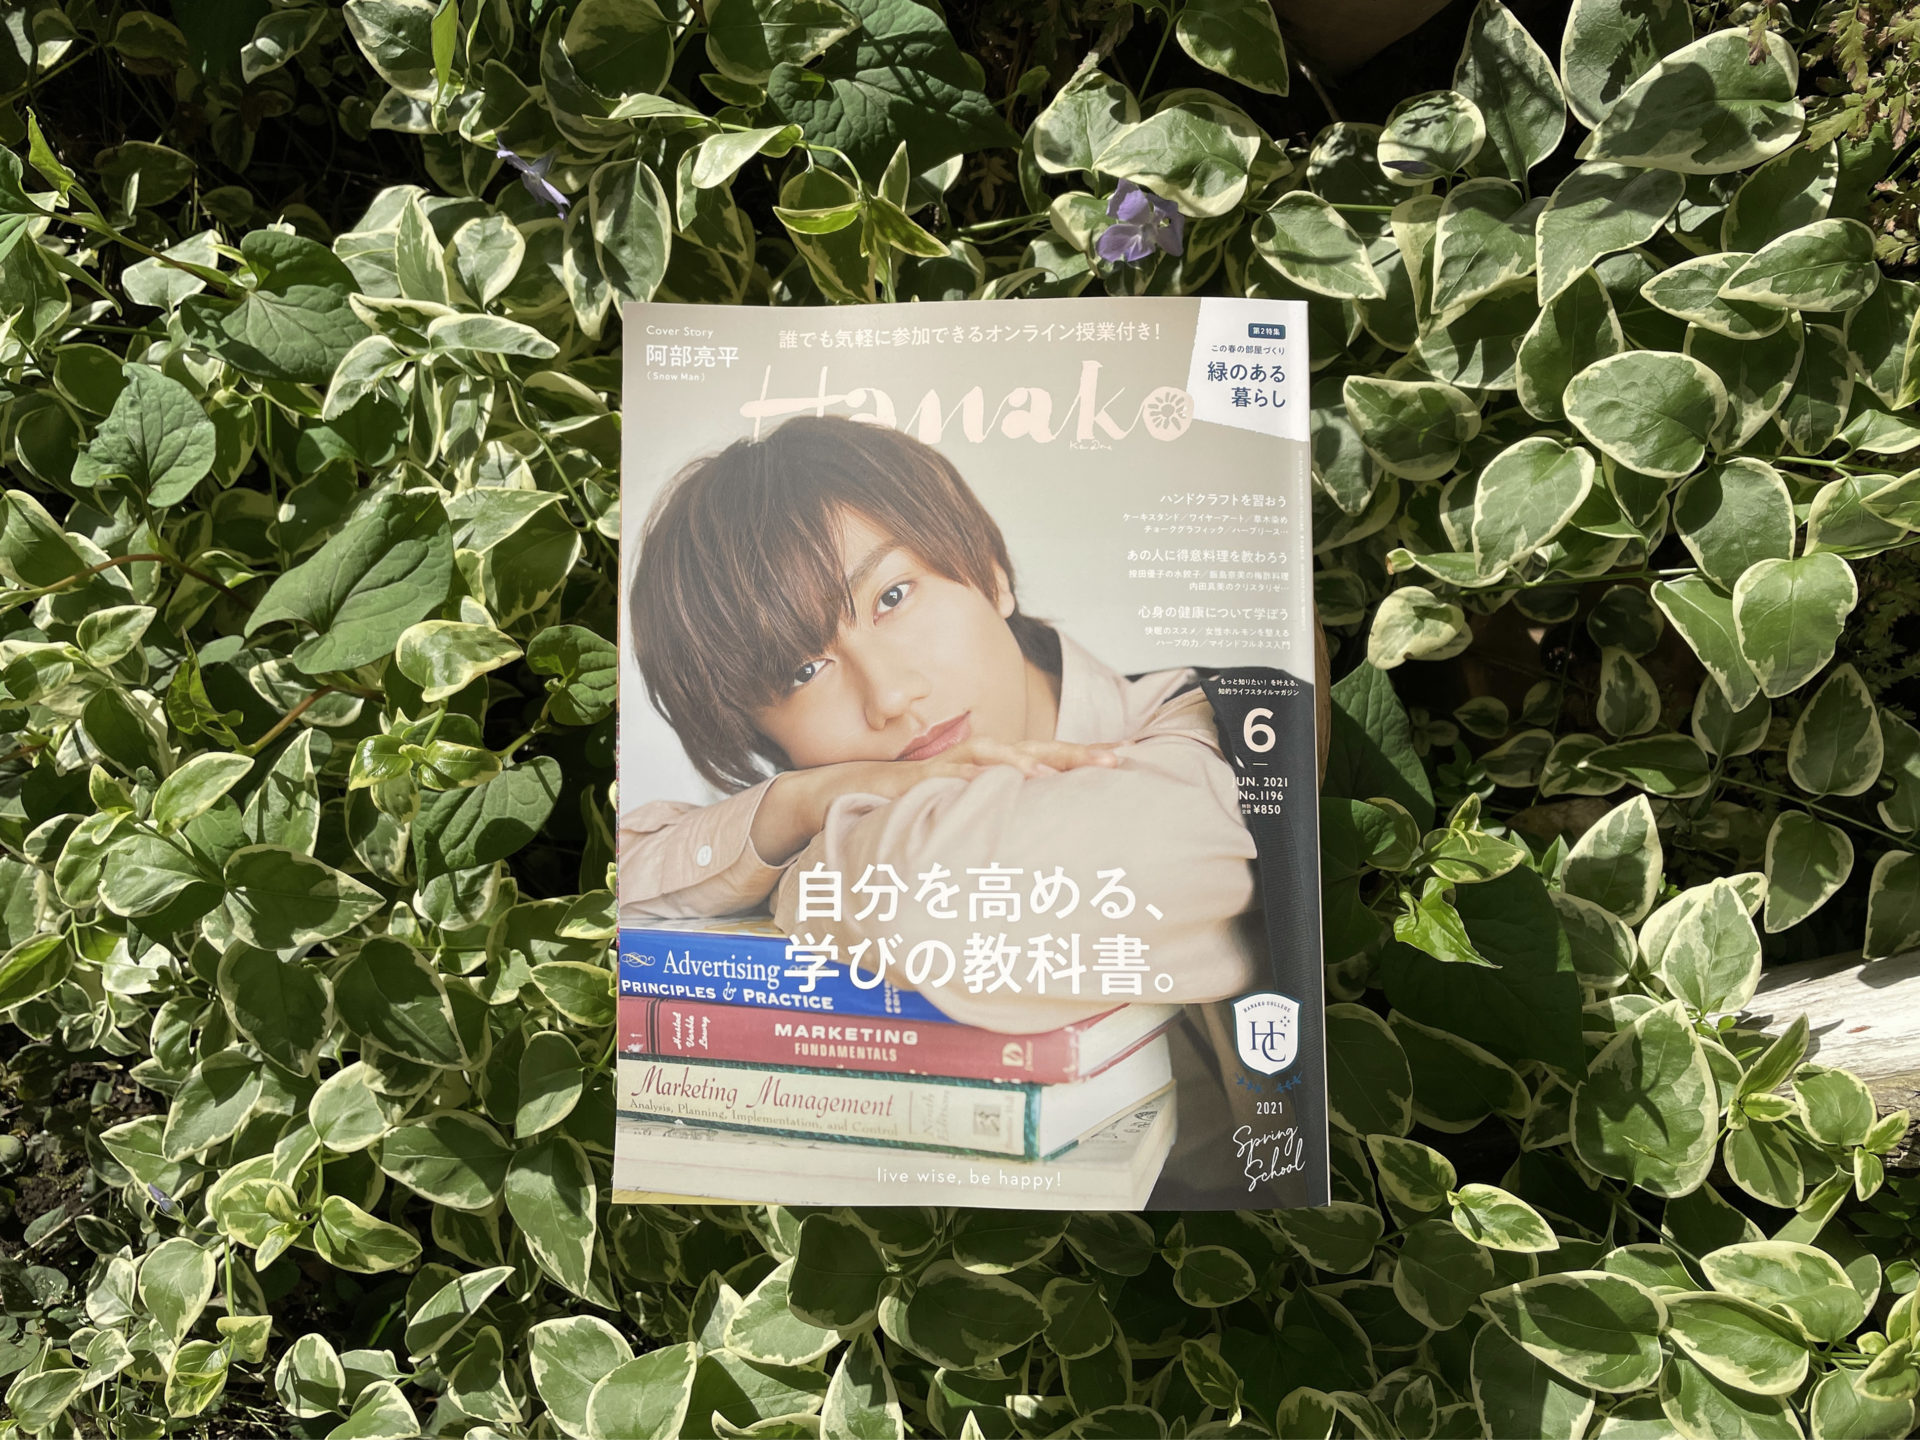 Hanako』(No.1196「学びの教科書」特集)